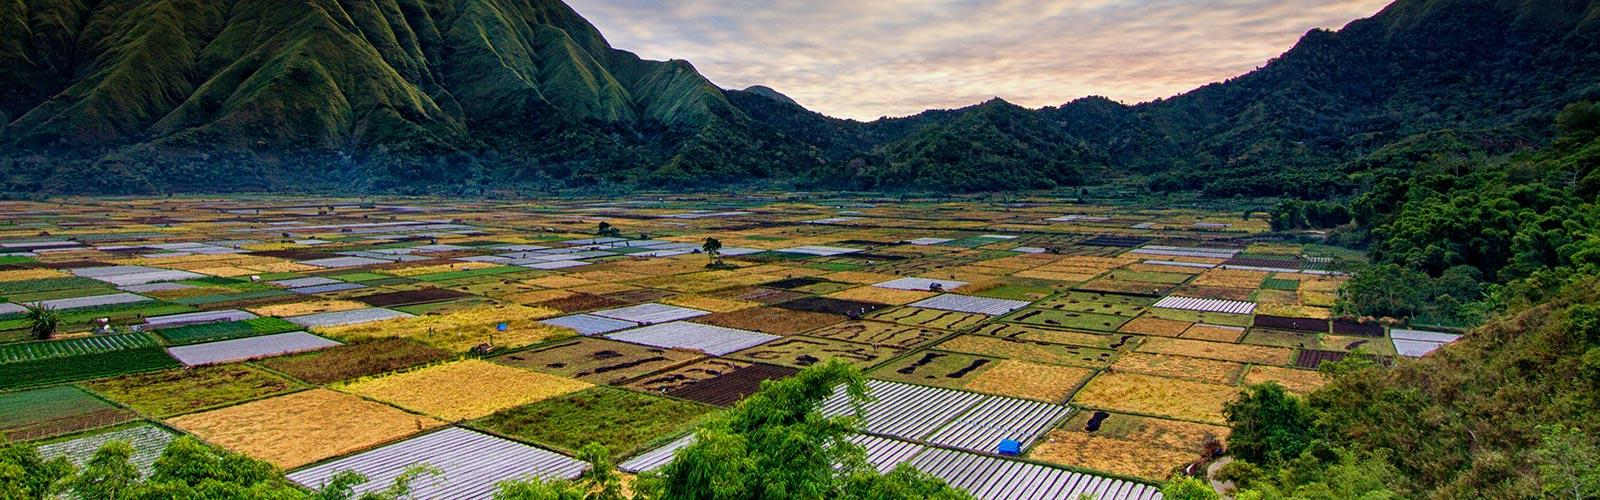 TER-koes-nadi-unsplash Paysage d'Indonésie Unsplash © K. Nadi